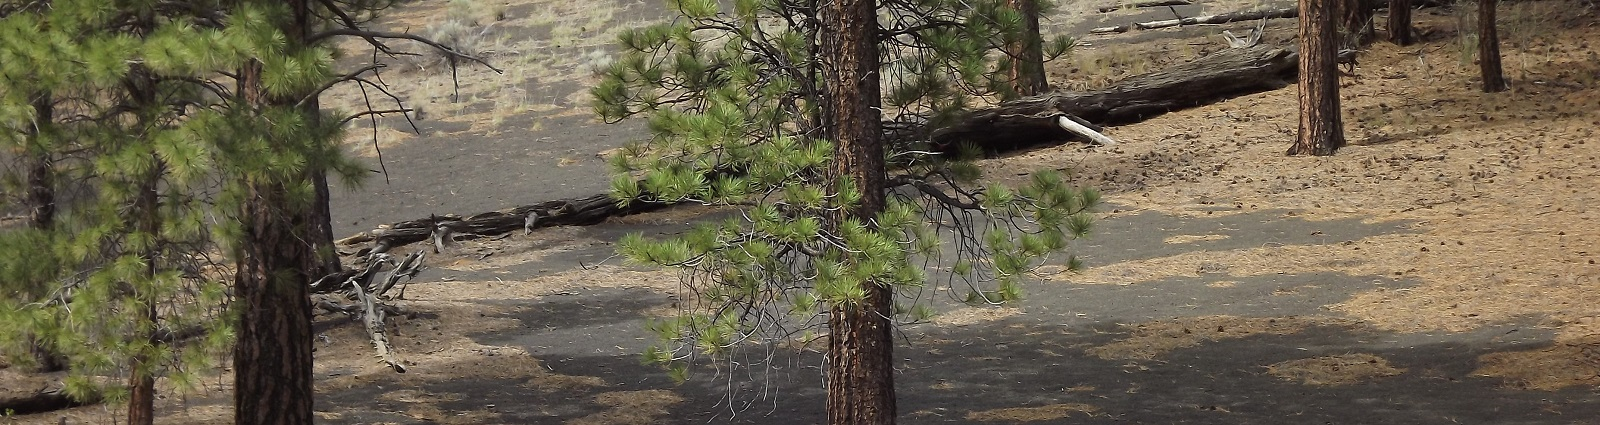 Trees on Hillside